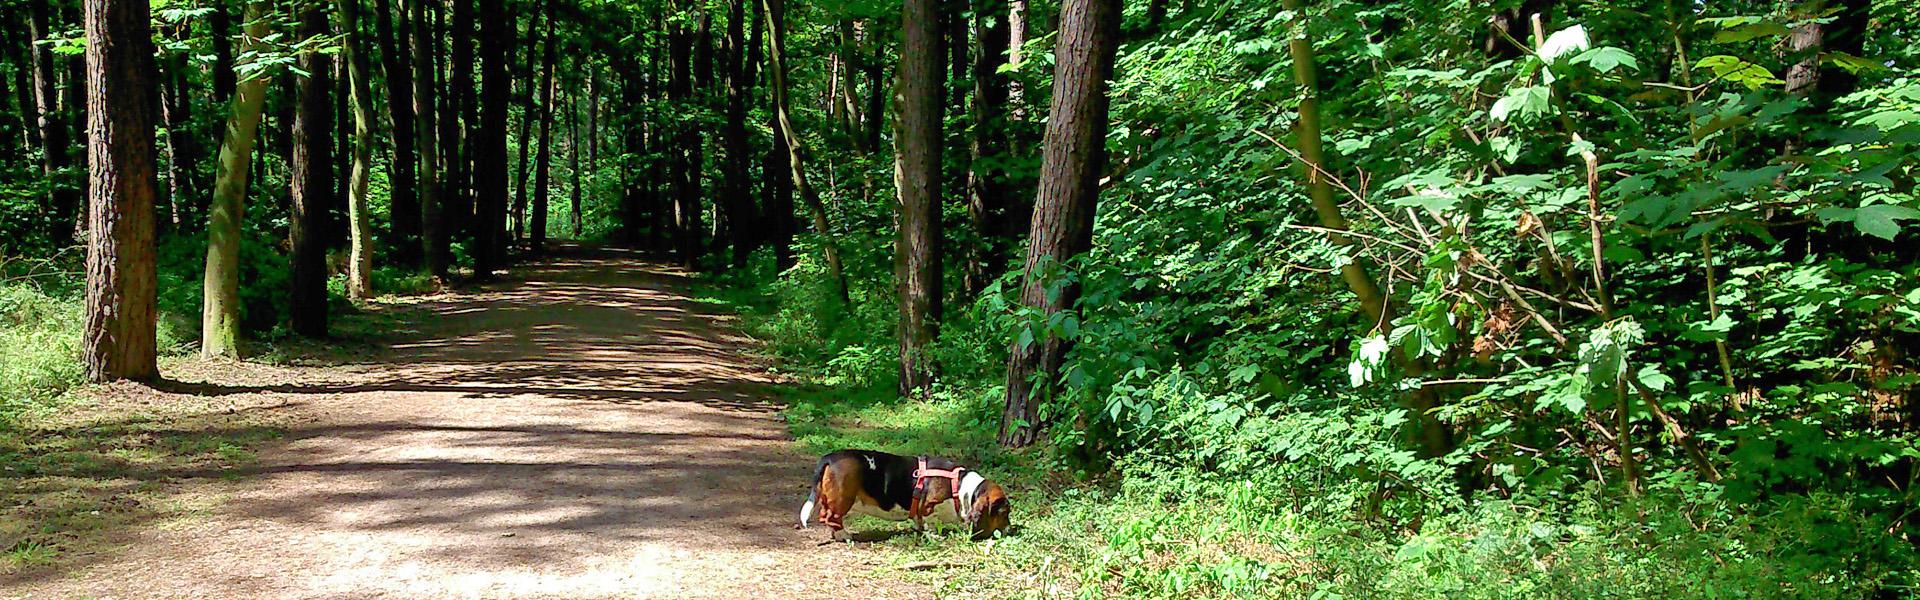 Lina im Wald